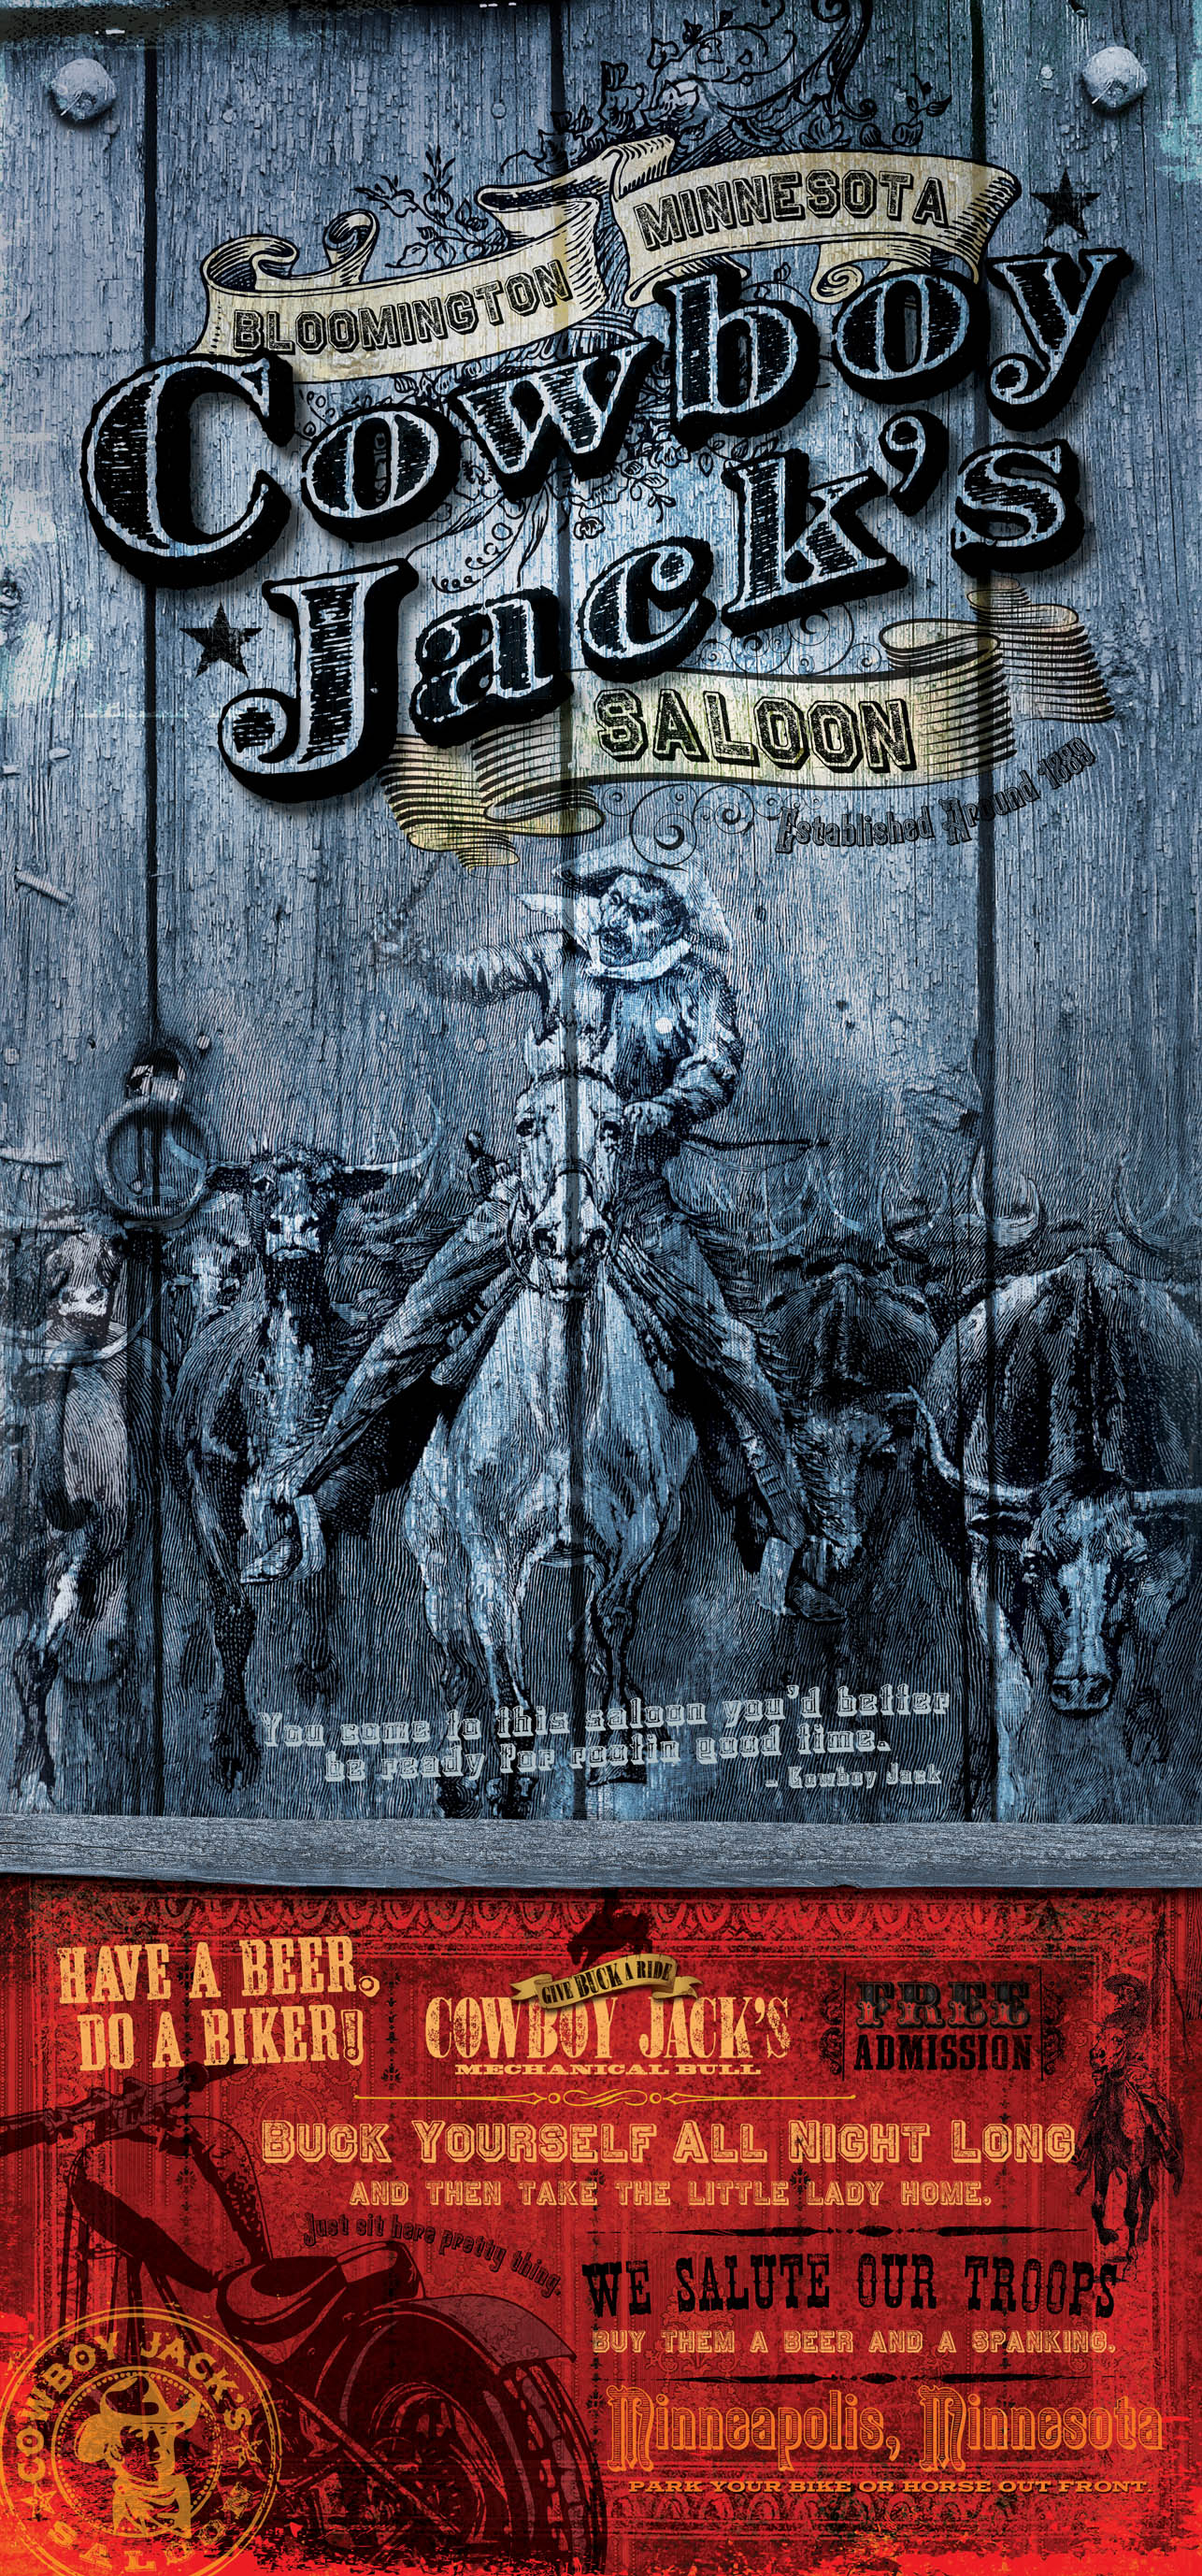 CowboyJacks Poster2.jpg